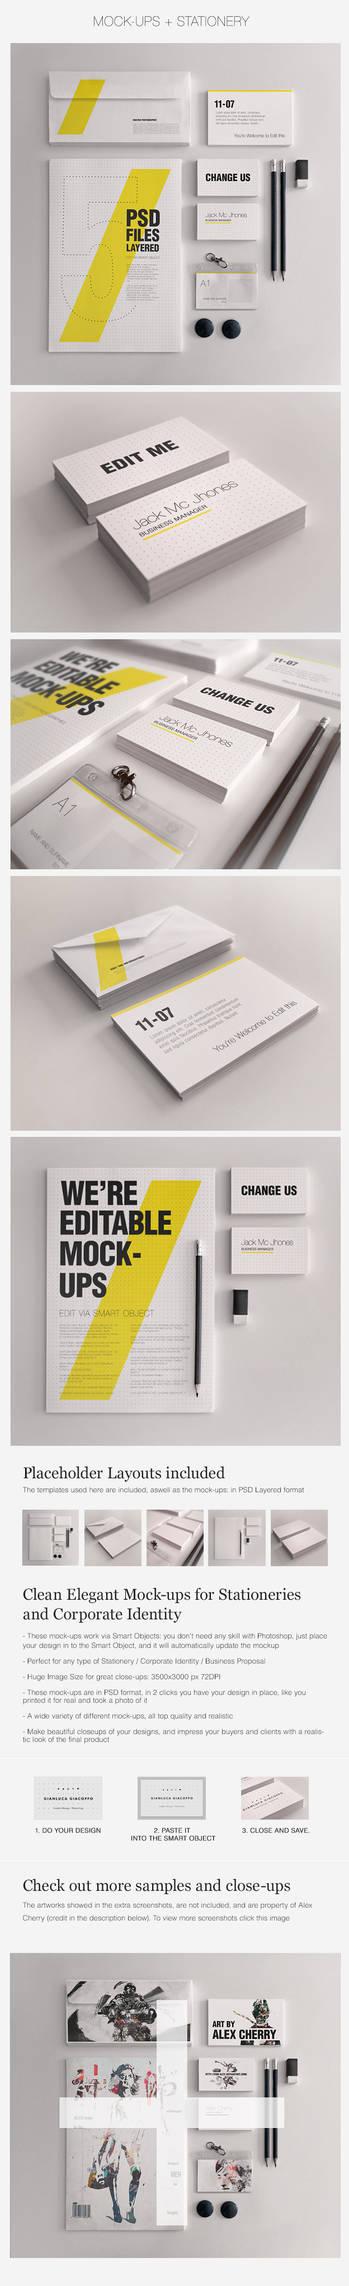 Realistic Stationery Mockups Set 1- Corporate ID